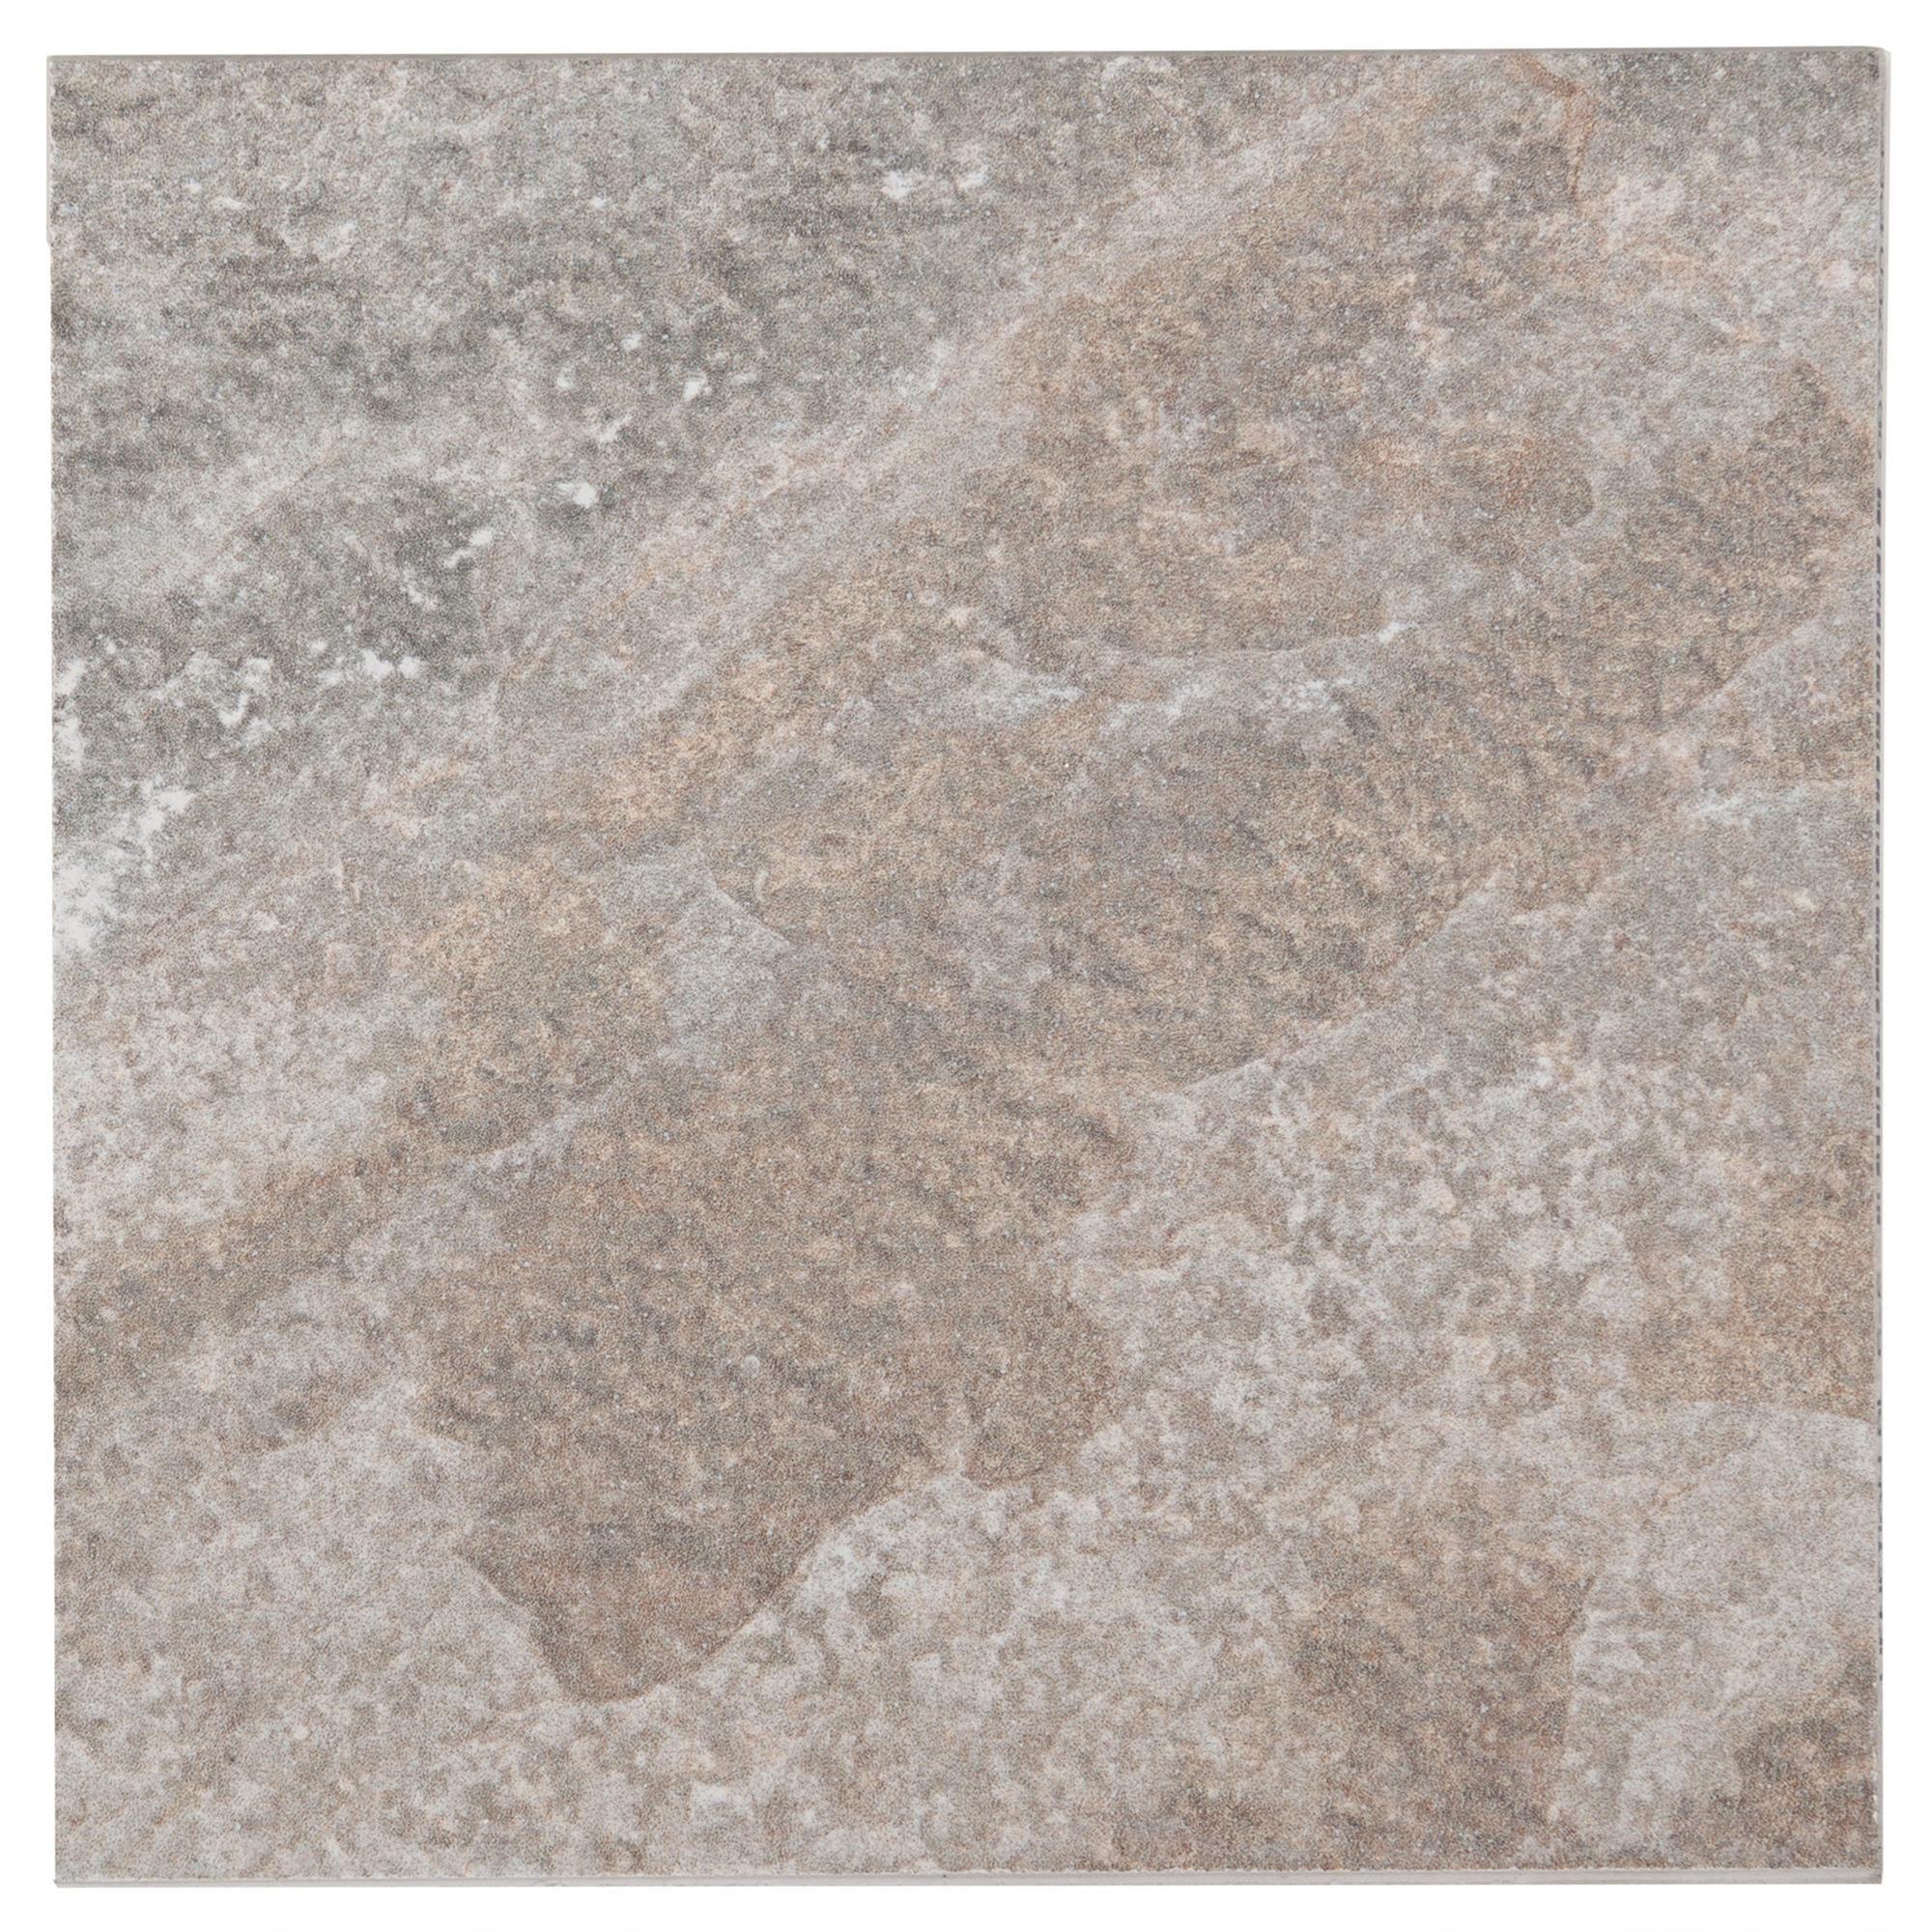 Floor Tile Decor Gorgeous Precious Stone Venetian Porcelain Tile  6Inx 6In 912102311 2018